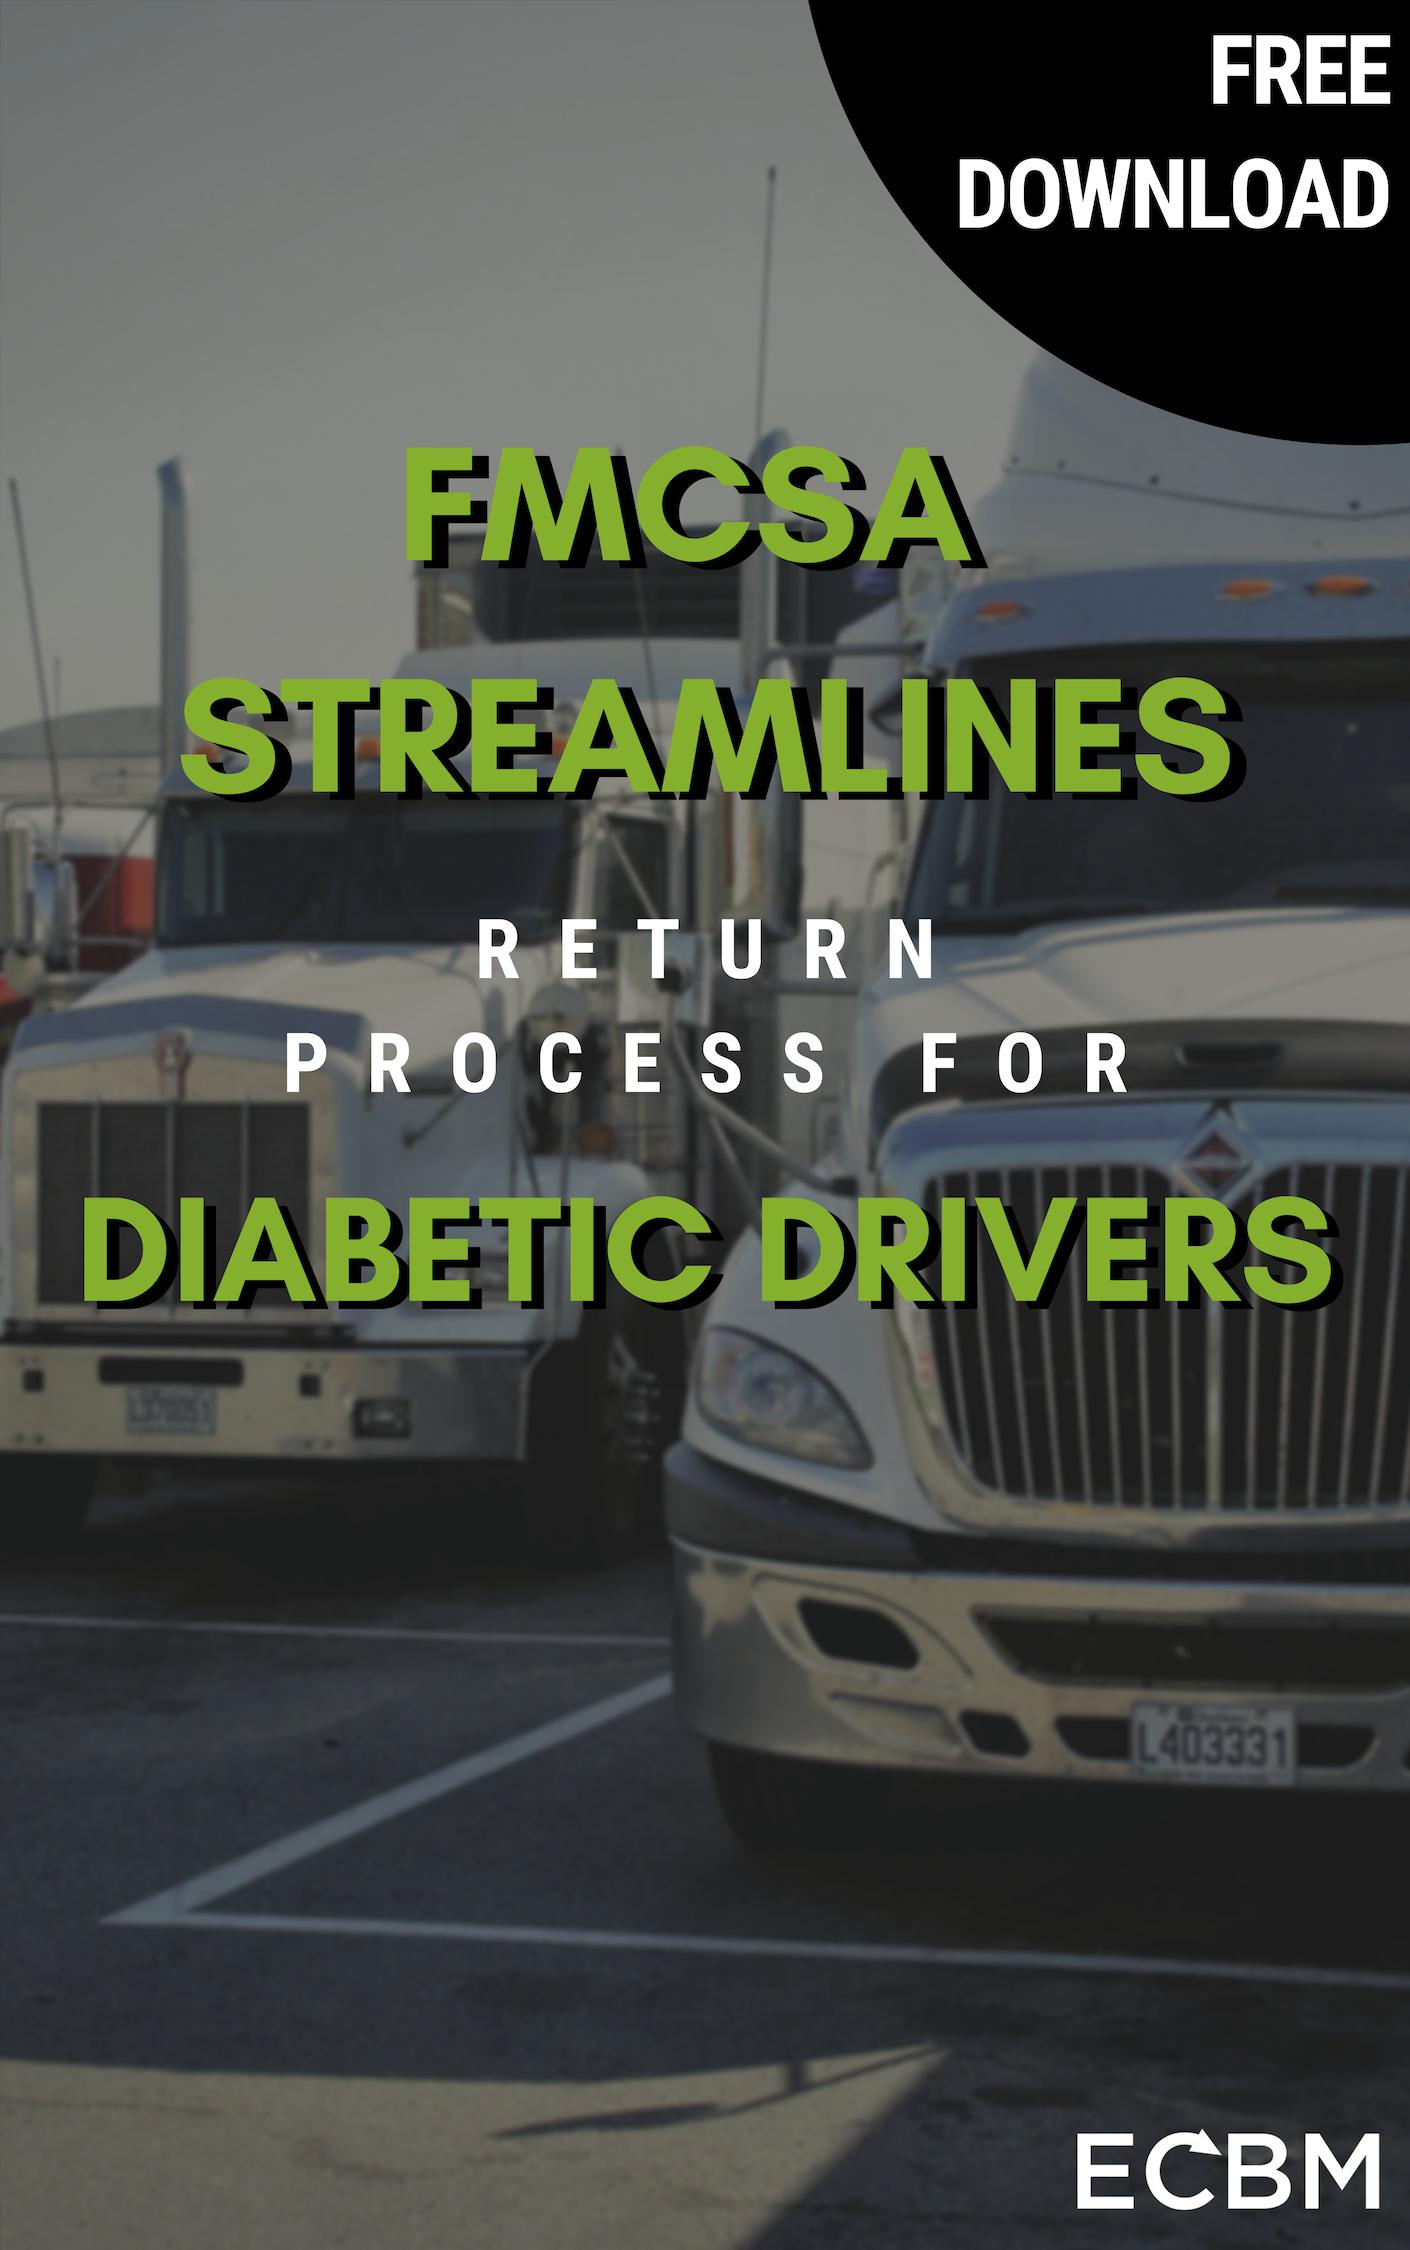 FMCSA Streamlines Return Process for Diabetic Drivers (1)